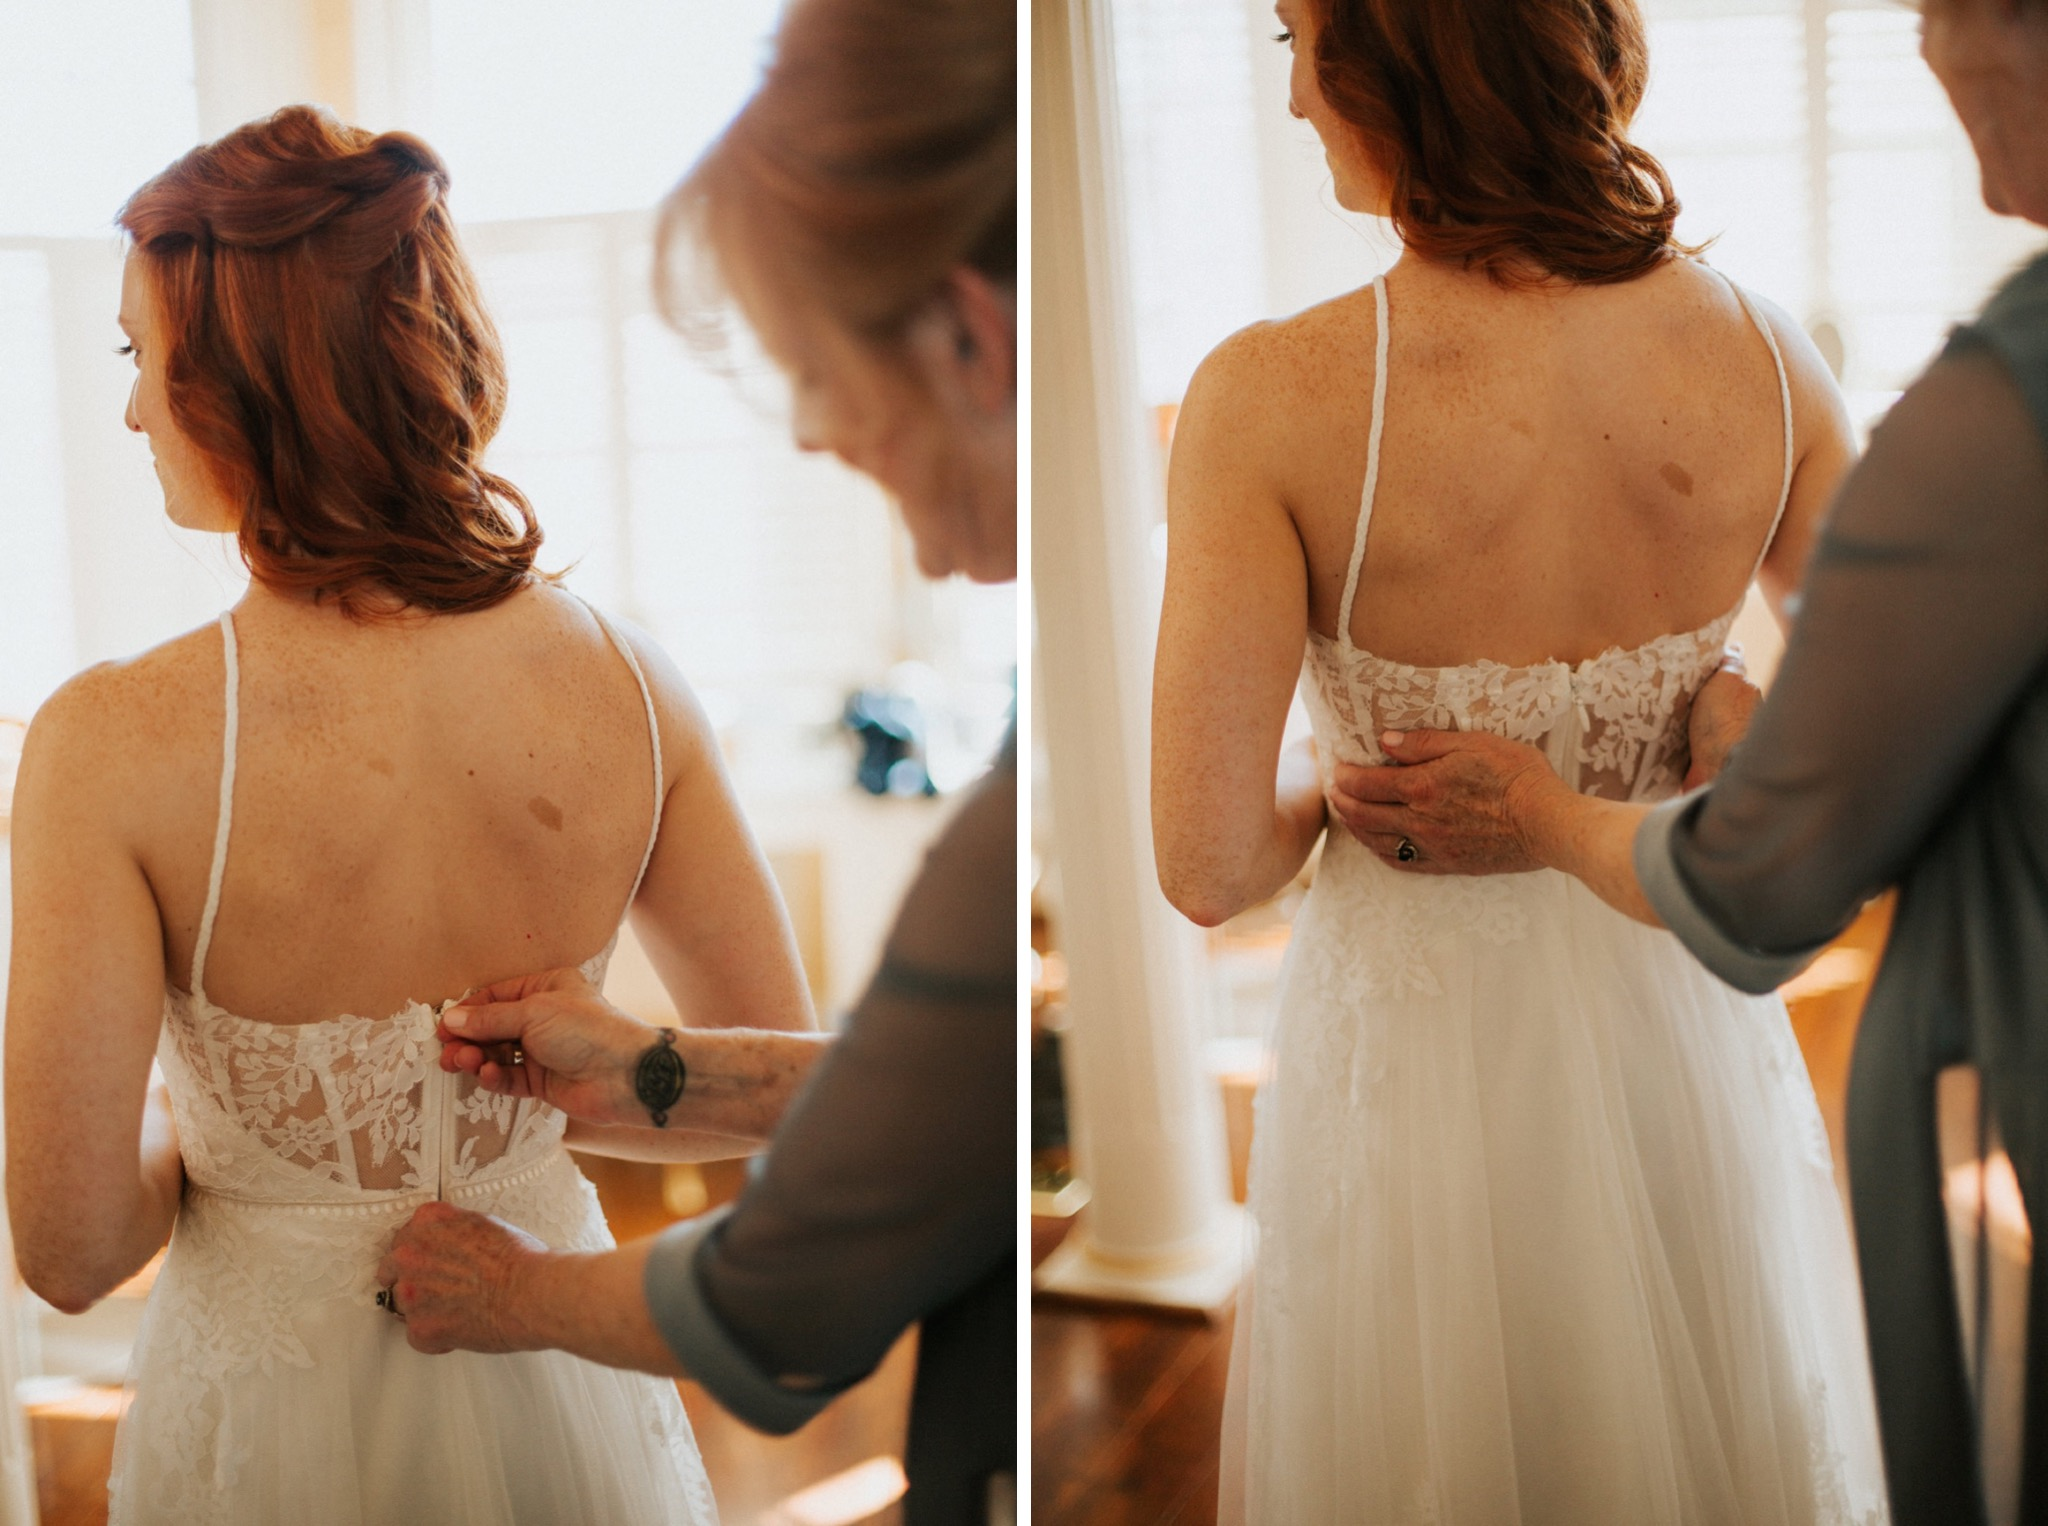 27_West Manor Estate Weddings - Pat Cori Photography-53_West Manor Estate Weddings - Pat Cori Photography-51_bride_VirginiaWeddingPhotographer_gettingready_WestManorEstate_Portraits_Wedding.jpg